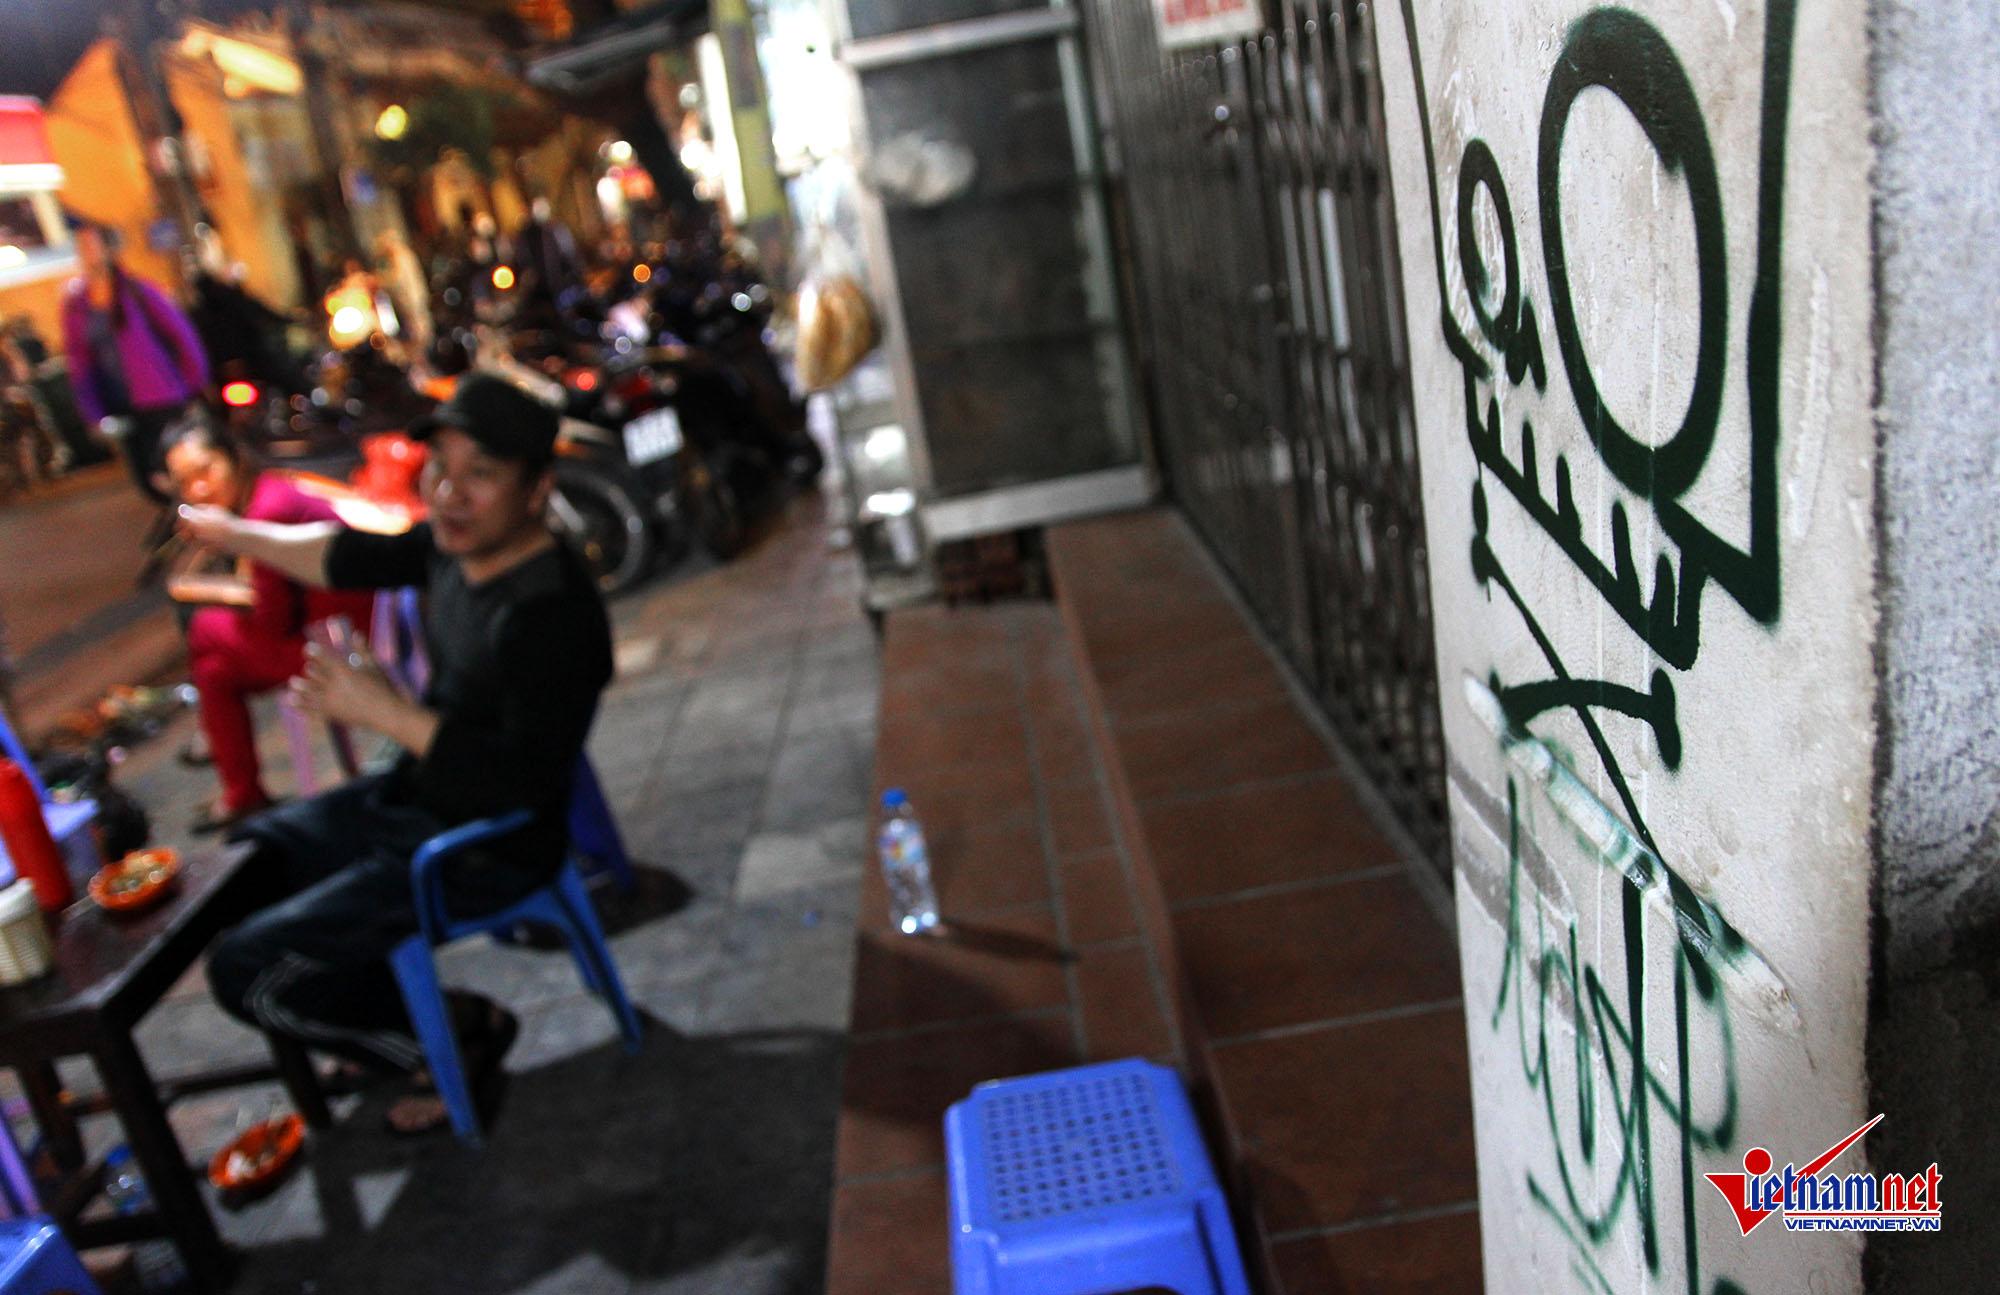 Hanoi Old Quarter suffers graffiti tag rash, entertainment events, entertainment news, entertainment activities, what's on, Vietnam culture, Vietnam tradition, vn news, Vietnam beauty, news Vietnam, Vietnam news, Vietnam net news, vietnamnet news, vietnam